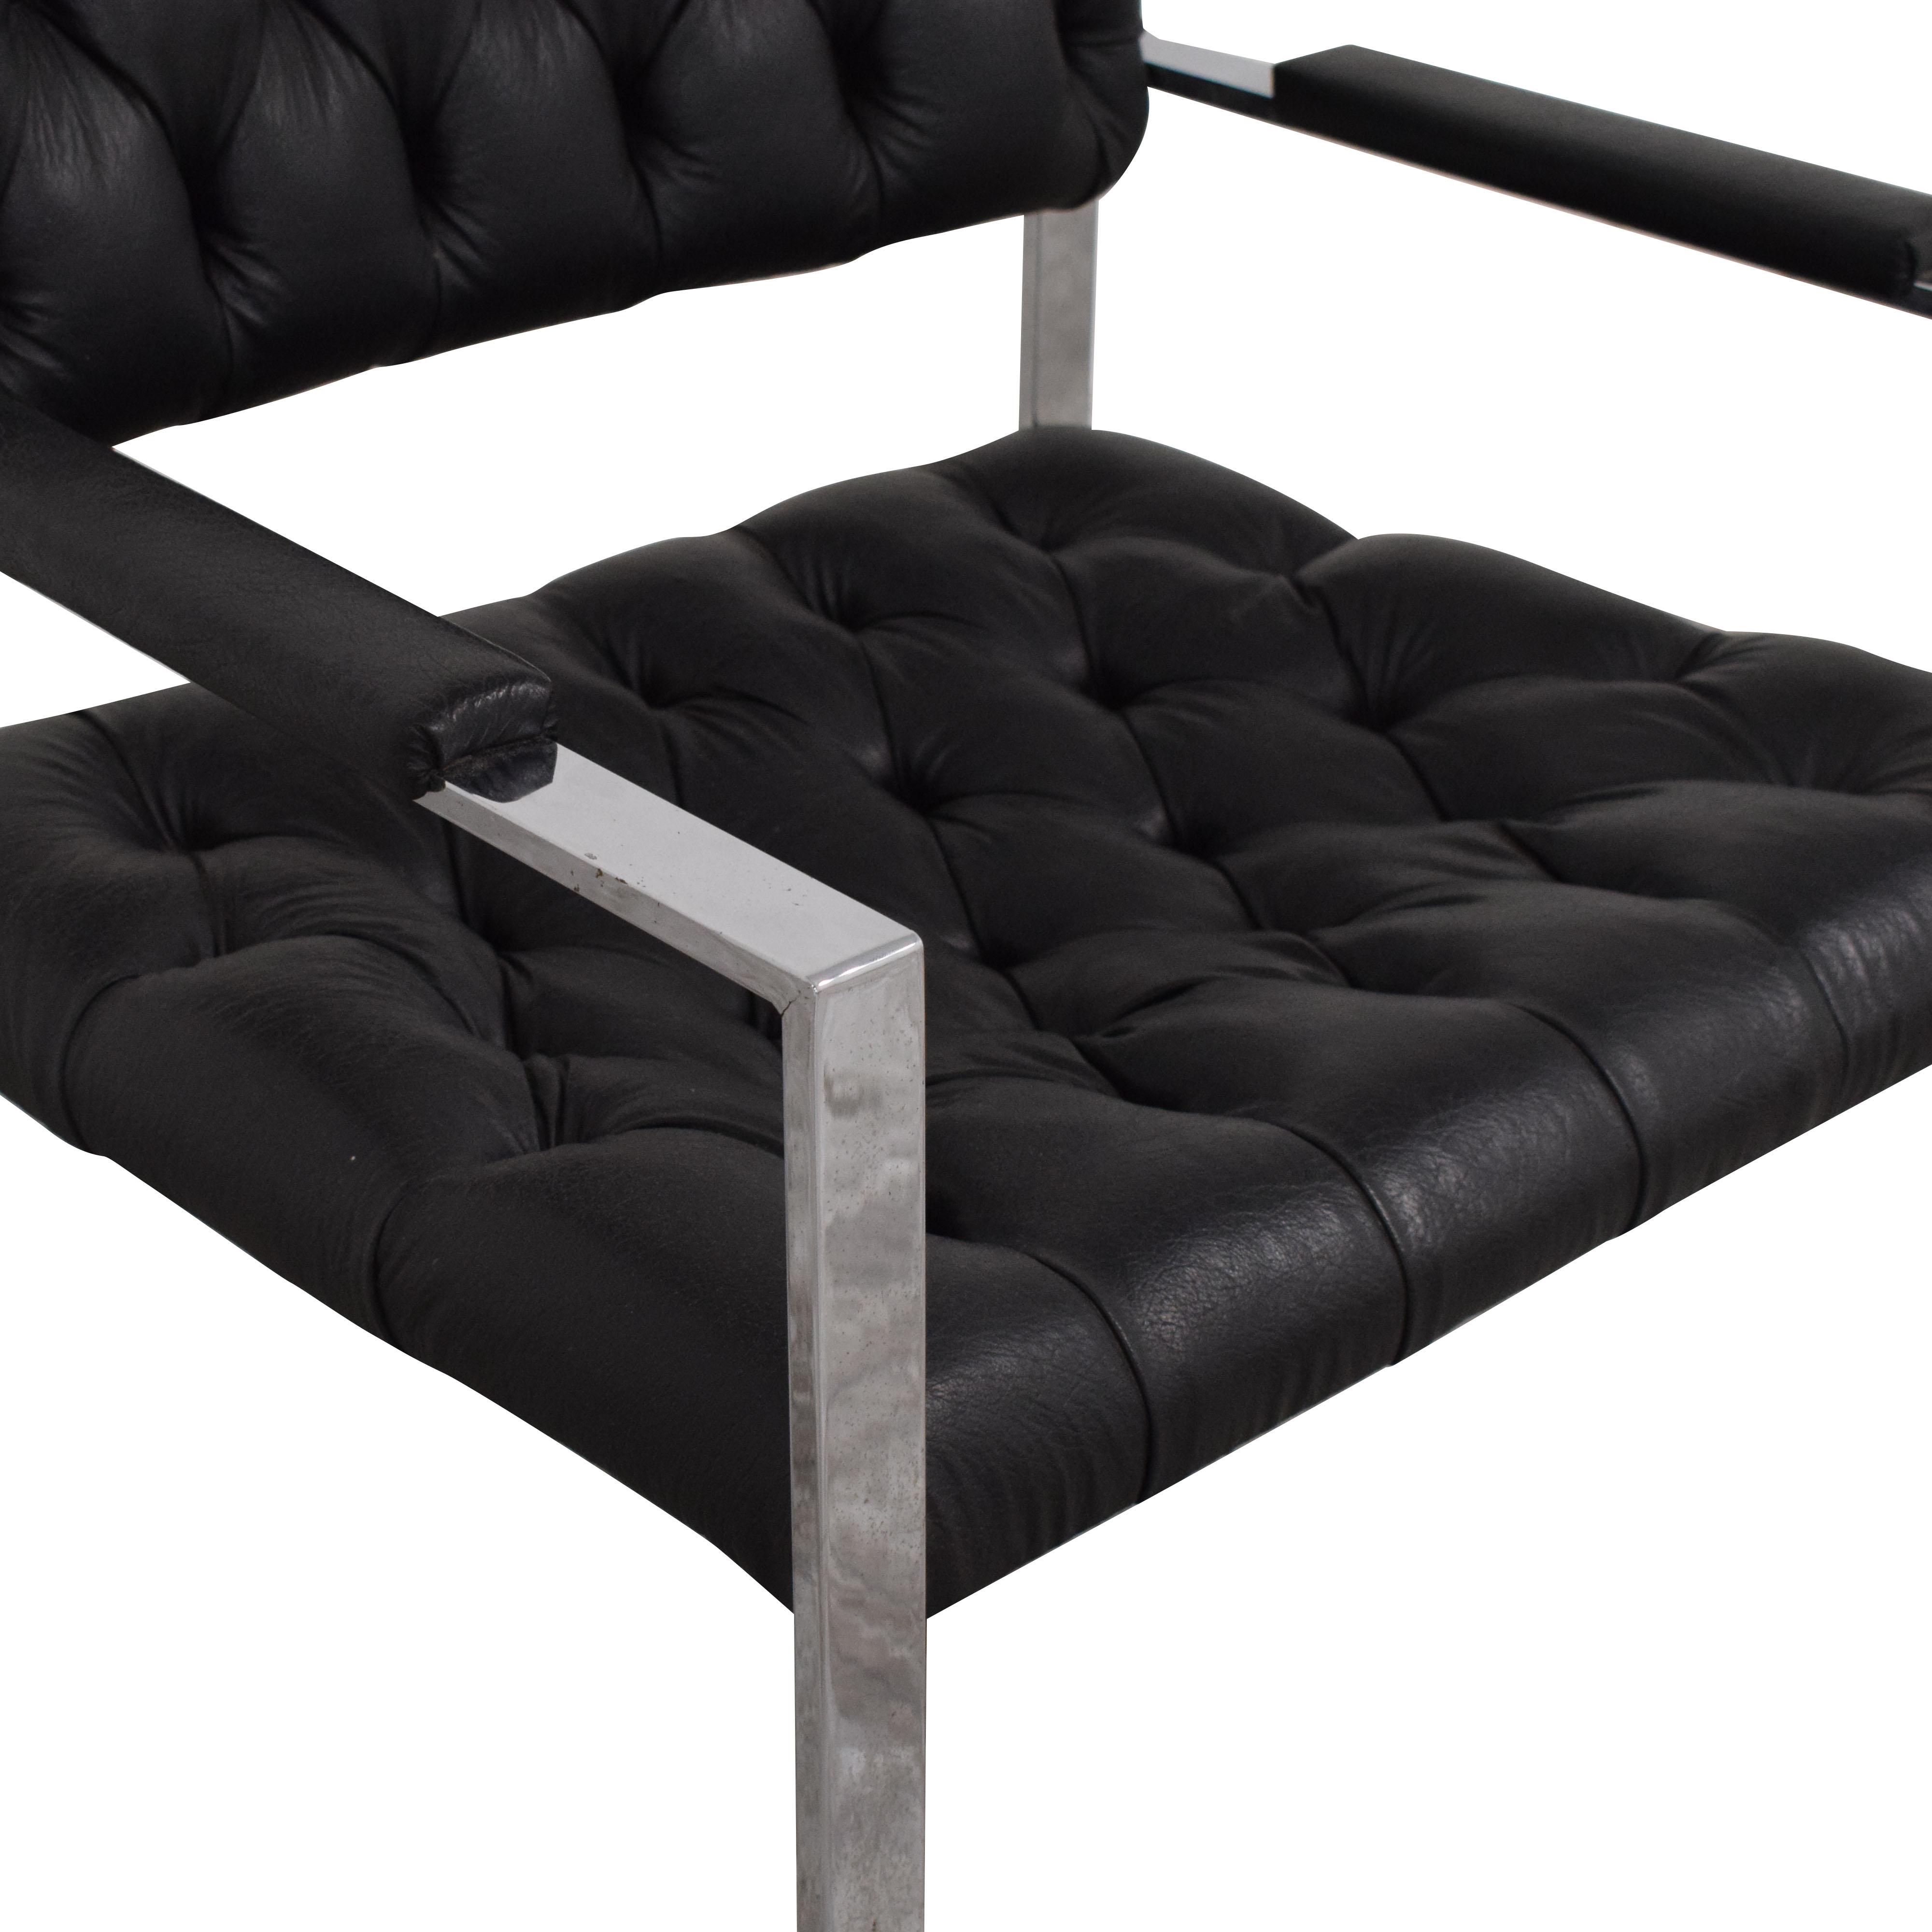 Thayer Coggin Milo Baughman for Thayer Coggin Black Tufted Arm Chair on sale